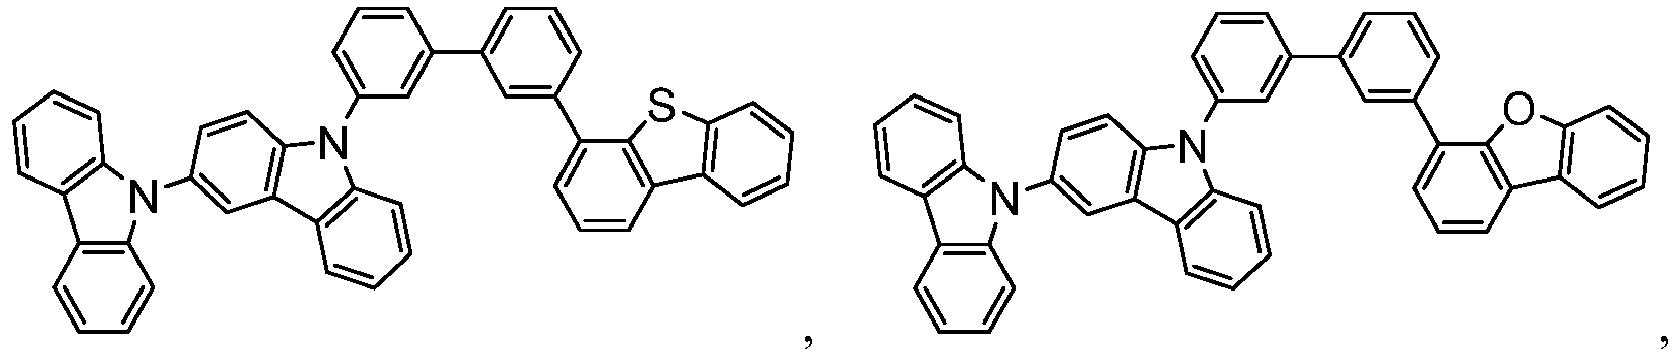 Figure imgb0887